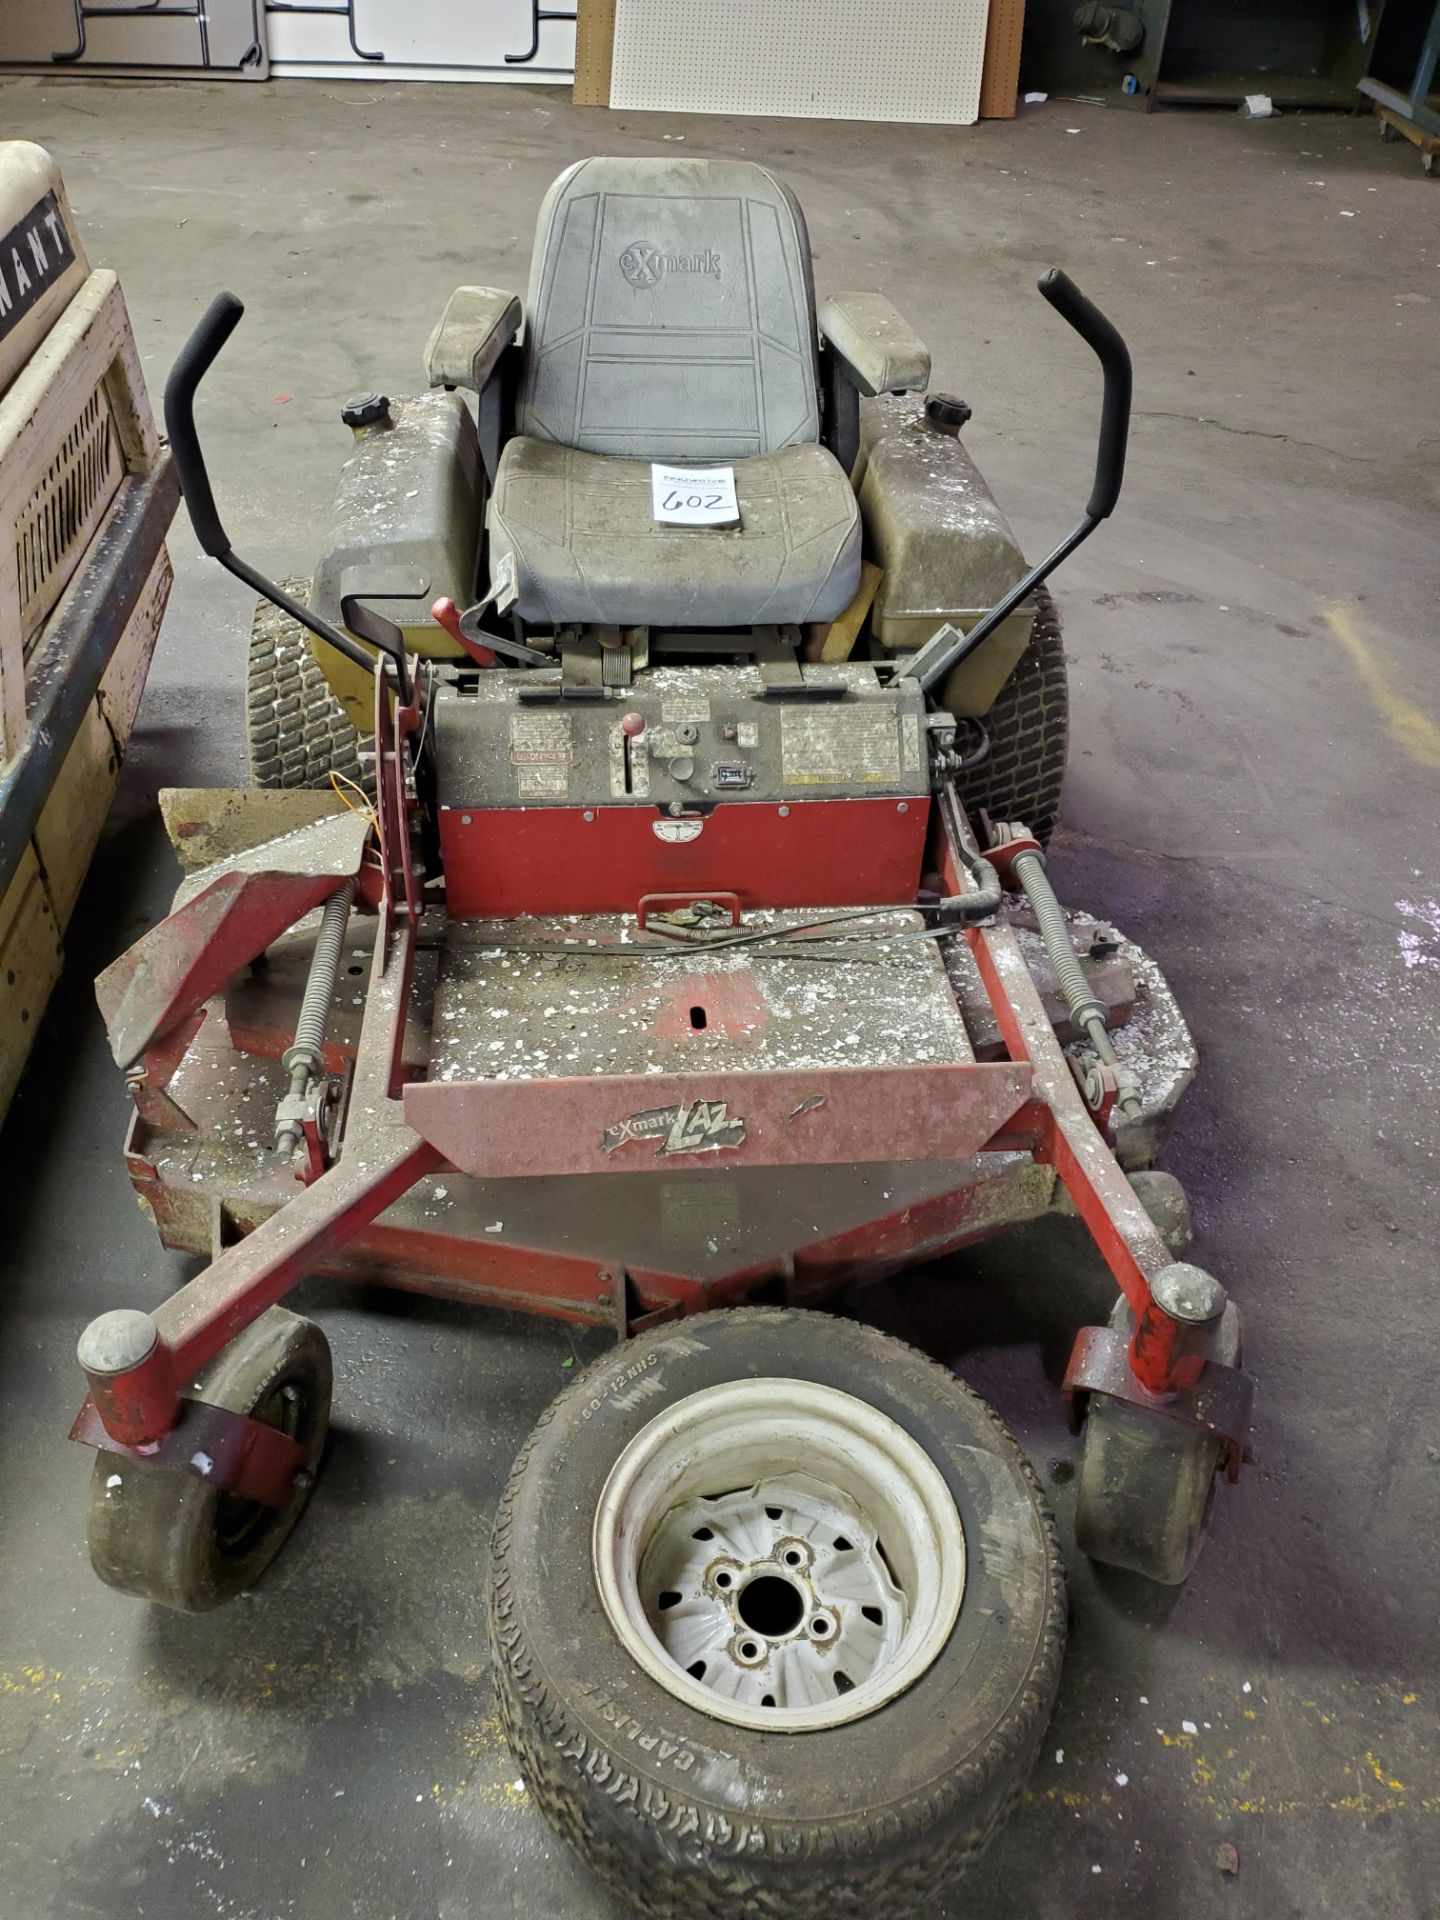 "Exmark Lazer Z Zero Turn Mower w/ 54"" Deck, 2117 Hours, Not in Service - Image 3 of 5"